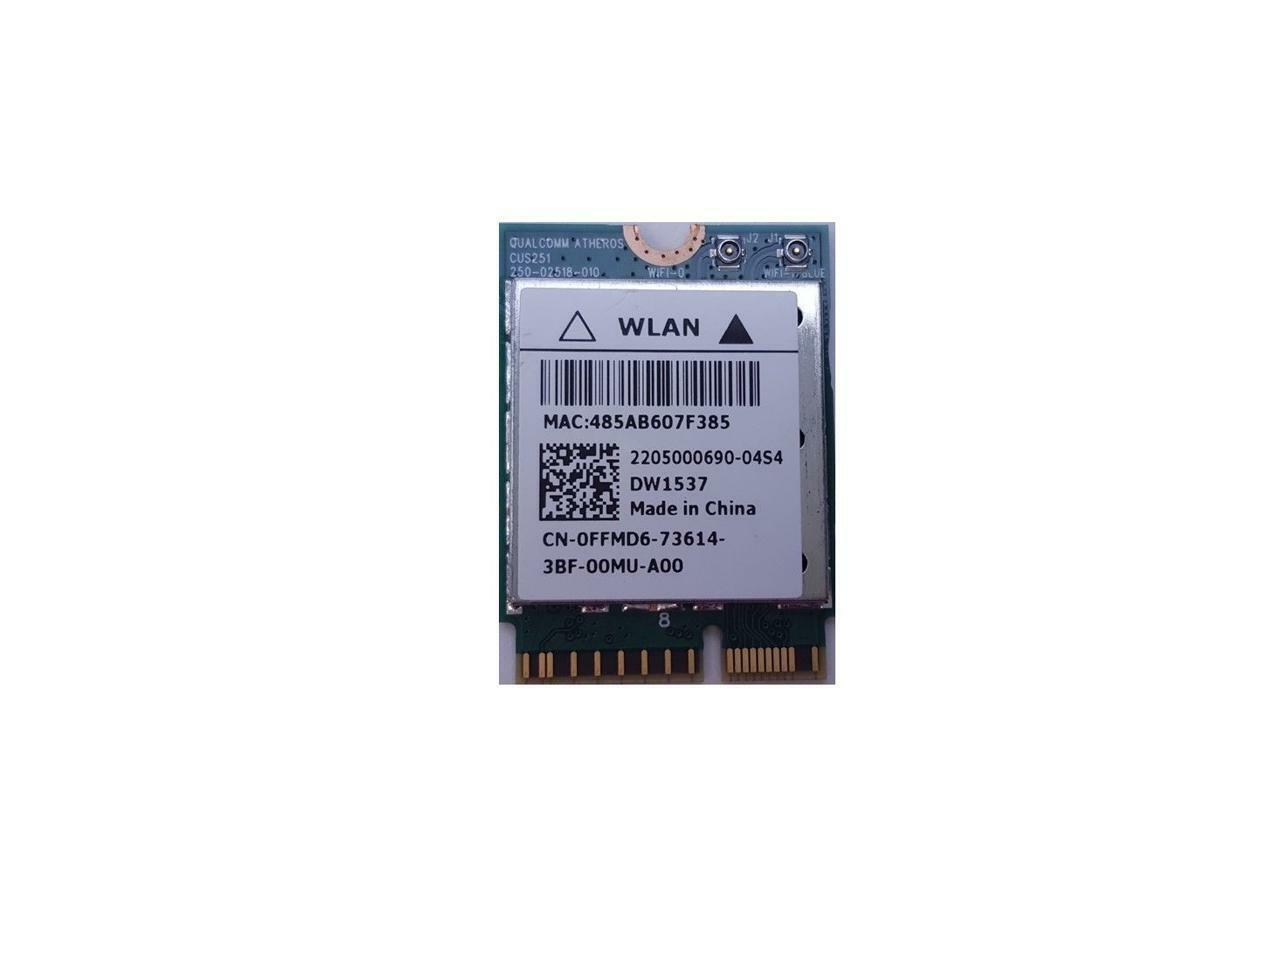 Dell Venue 11 Pro 7130 7139 Wireless Bluetooth 4.0 m.2 Card QCSNFA282 FFMD6